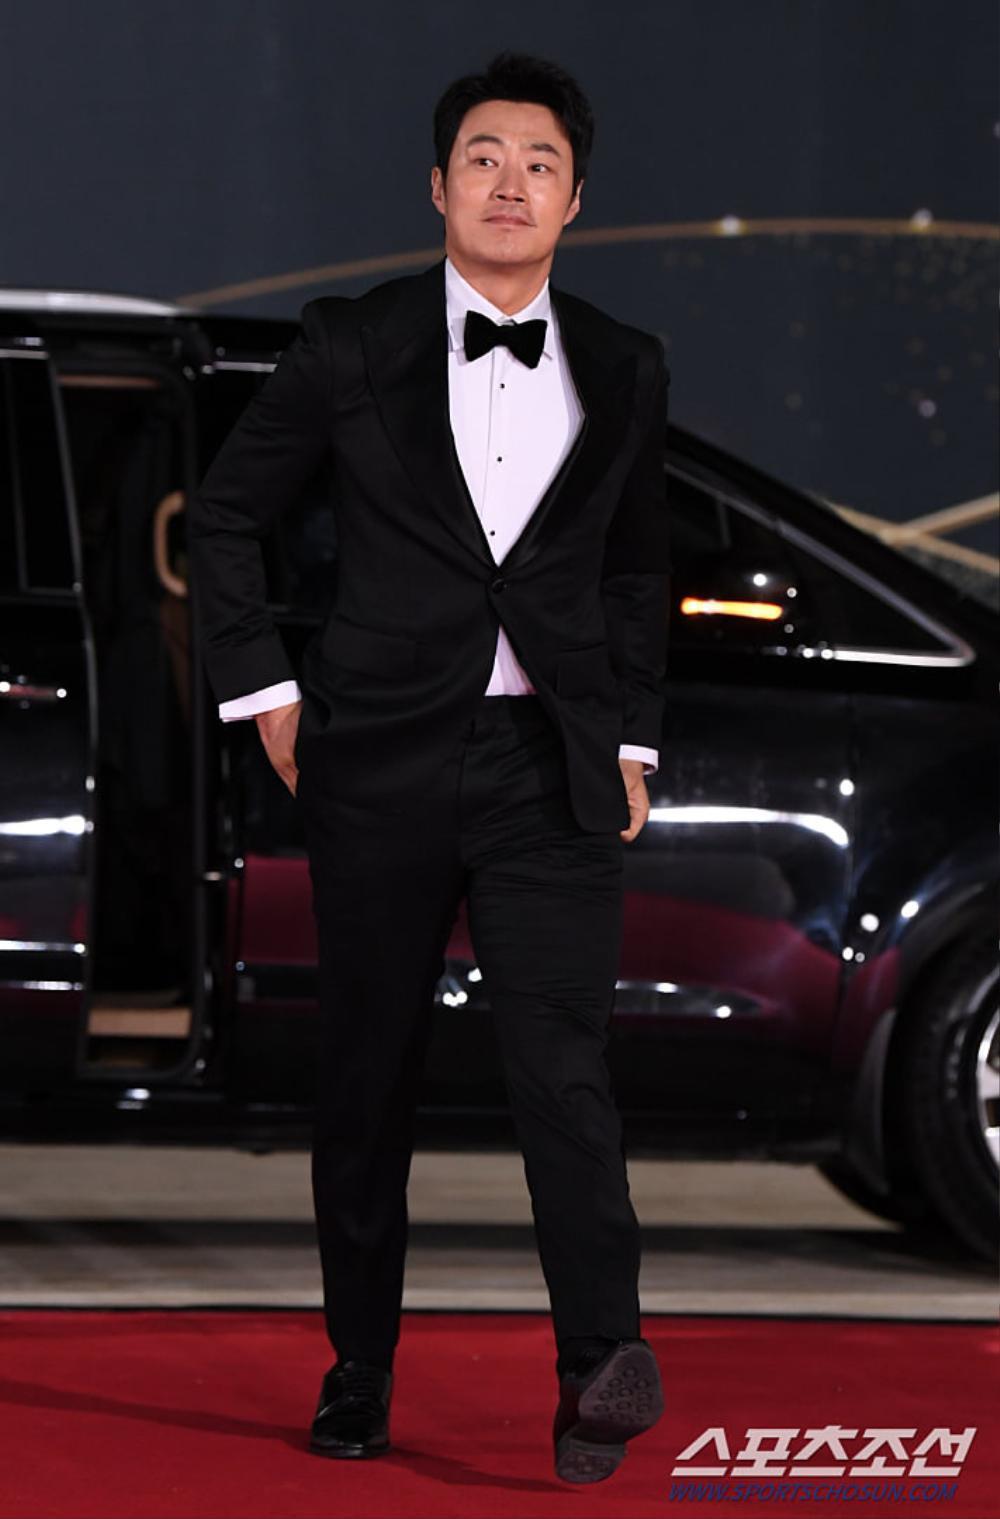 Thảm đỏ 'Rồng xanh 2020': Shin Hye Sun 'cân sắc' Shin Min Ah, Jung Woo Sung - Lee Byung Hun điển trai! Ảnh 41